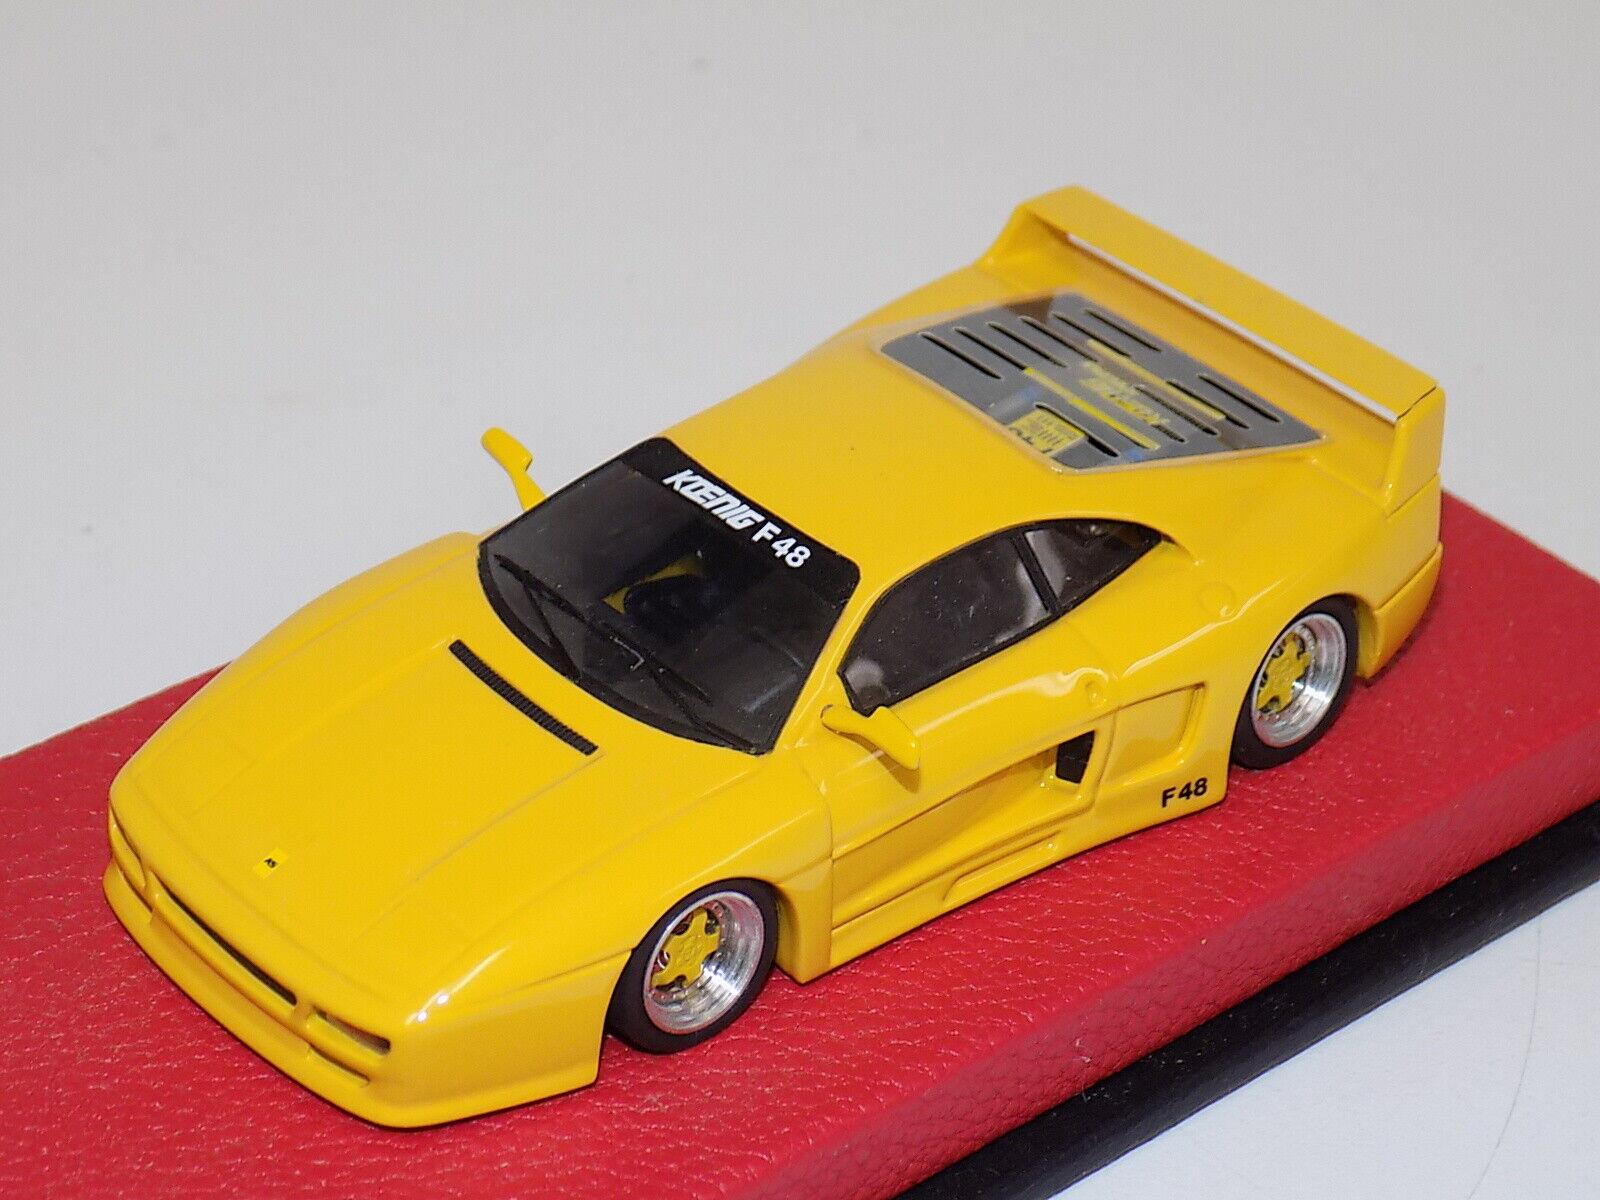 1 43 BBR Ferrari F48 Koenig from 1991 in Yellow on Red Leather  BBR37B    GP038